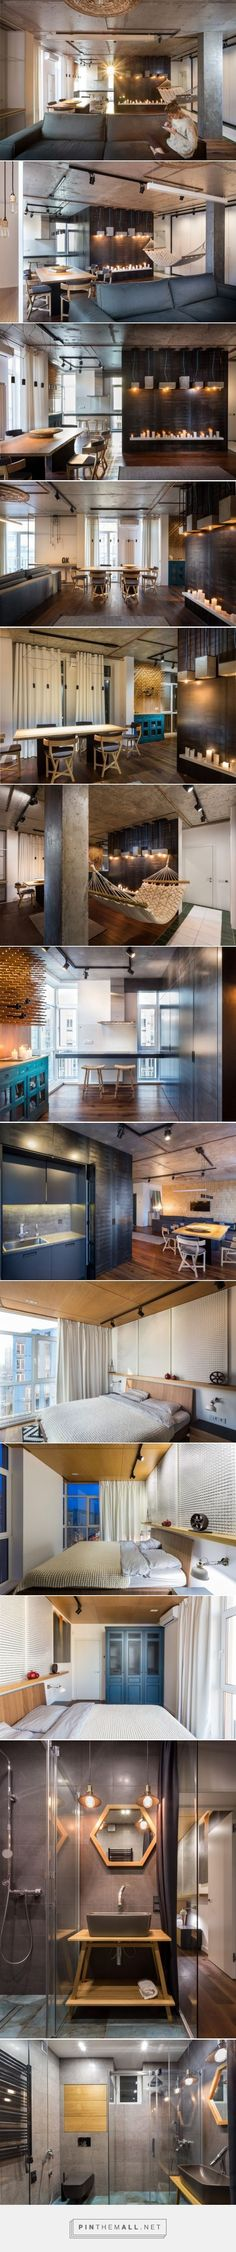 True Apartment by Svoya Studio | HomeAdore - created via pinthemall.net